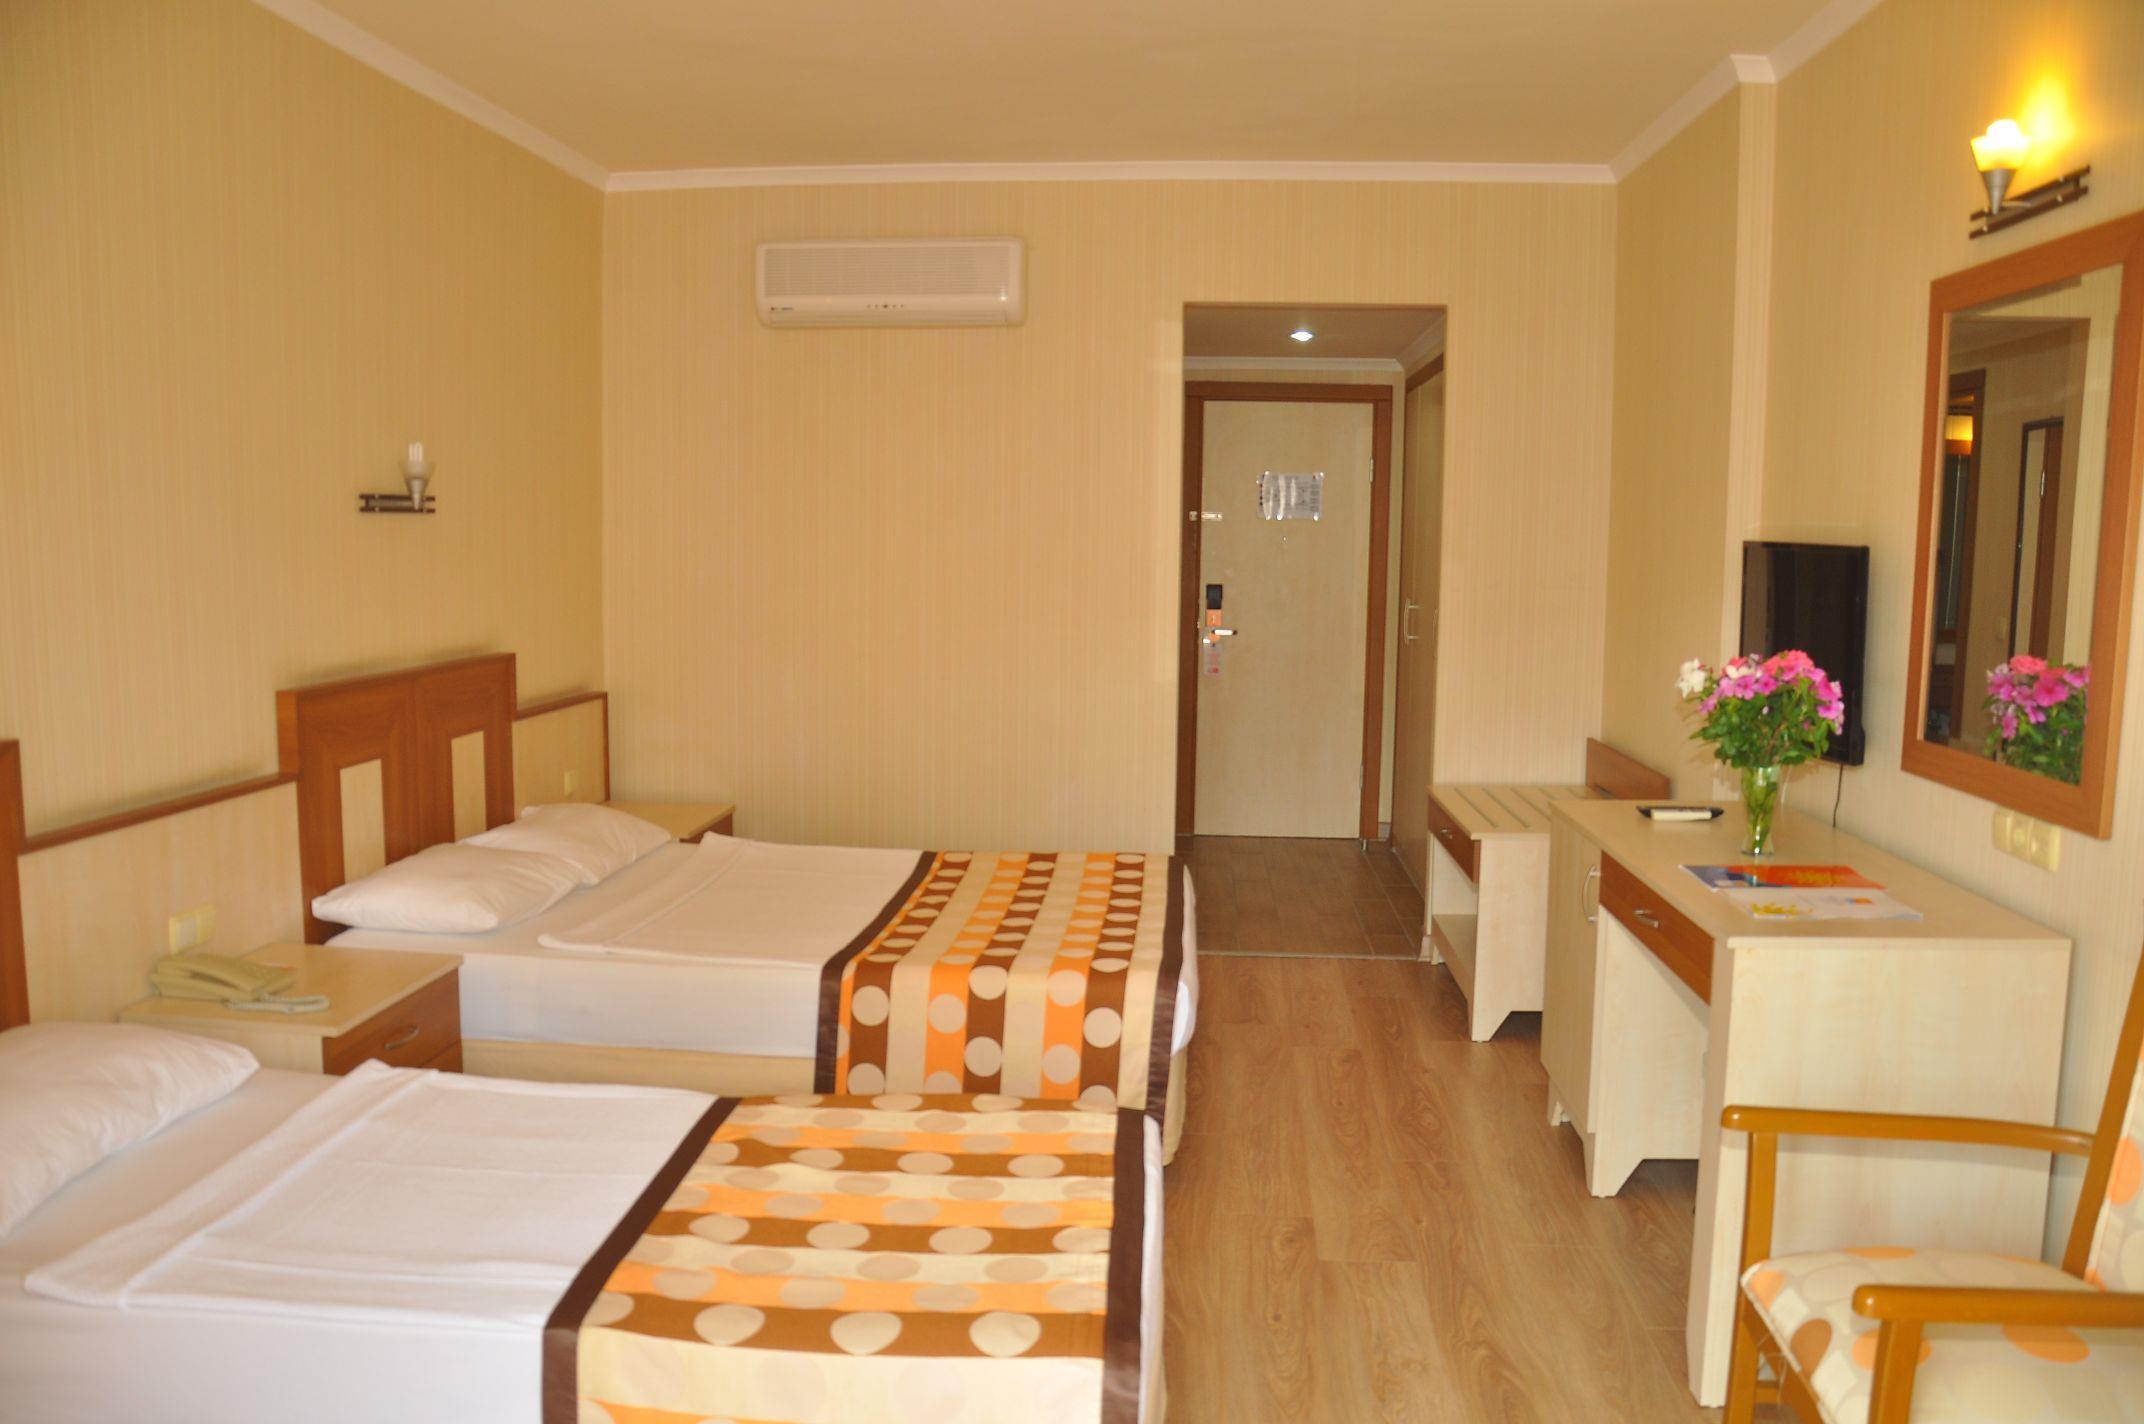 http://www.orextravel.sk/OREX/hotelphotos/stella-beach-hotel-alanya-general-0026.jpg